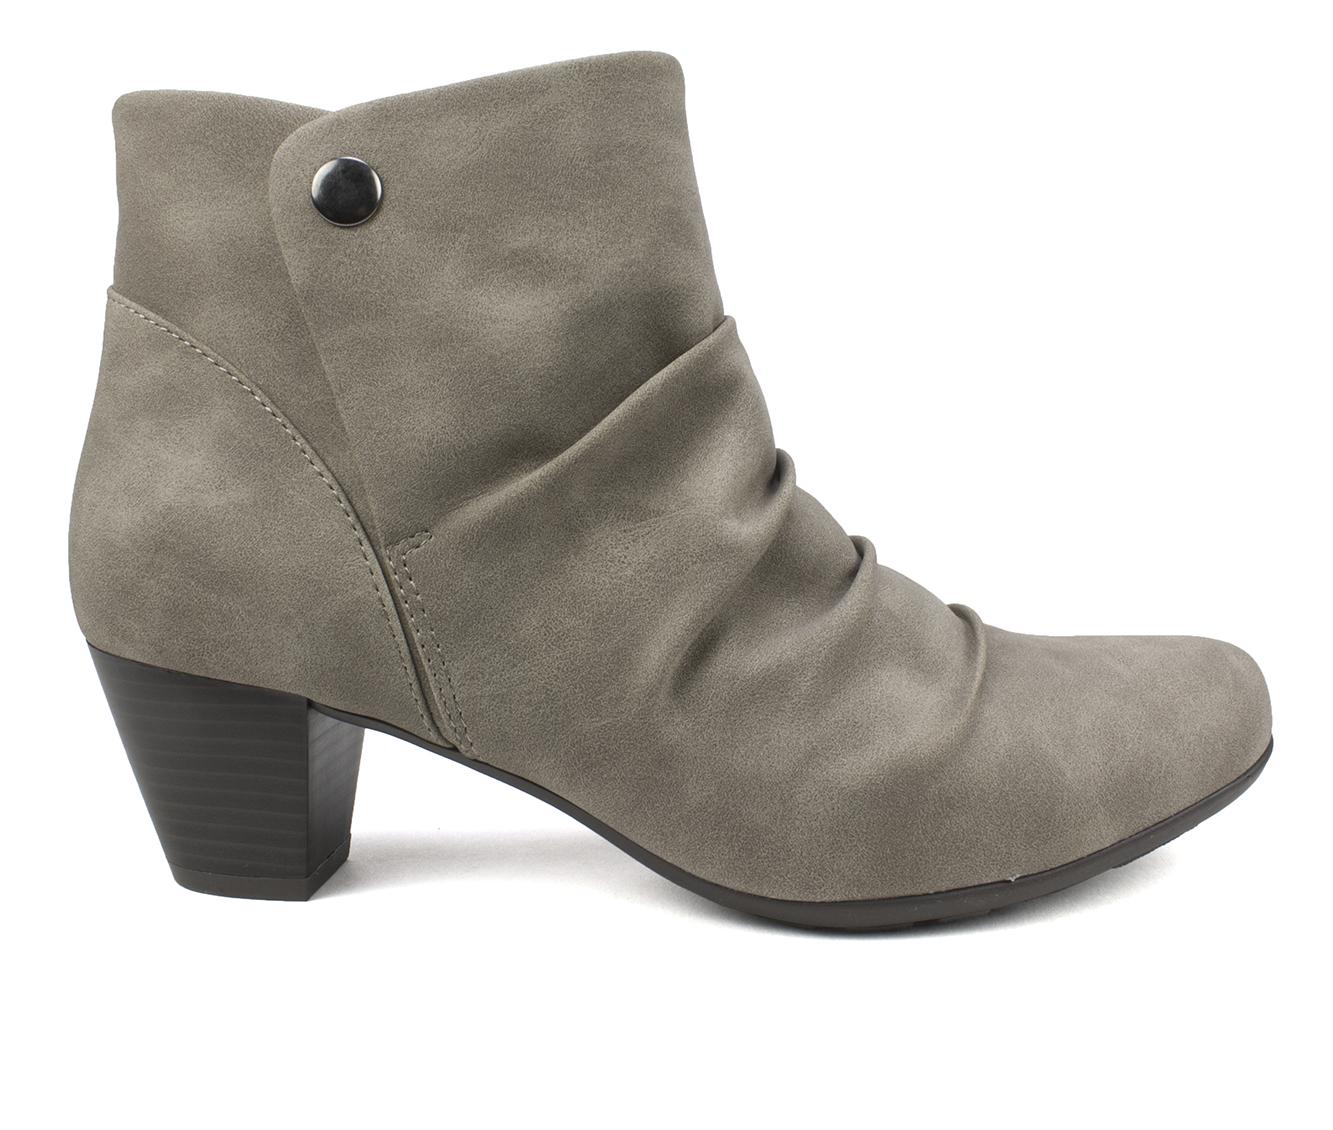 Cliffs Landon Women's Boot (Gray Faux Leather)